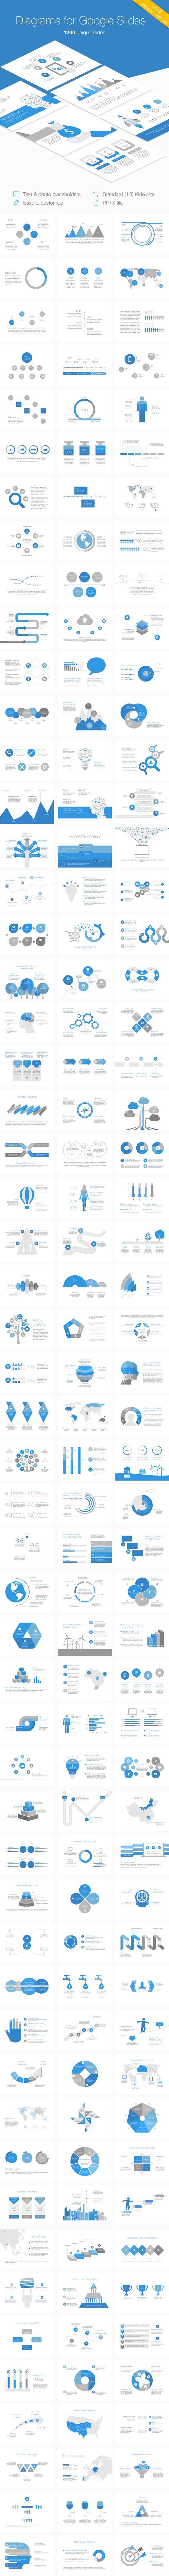 Diagrams for Google Slides